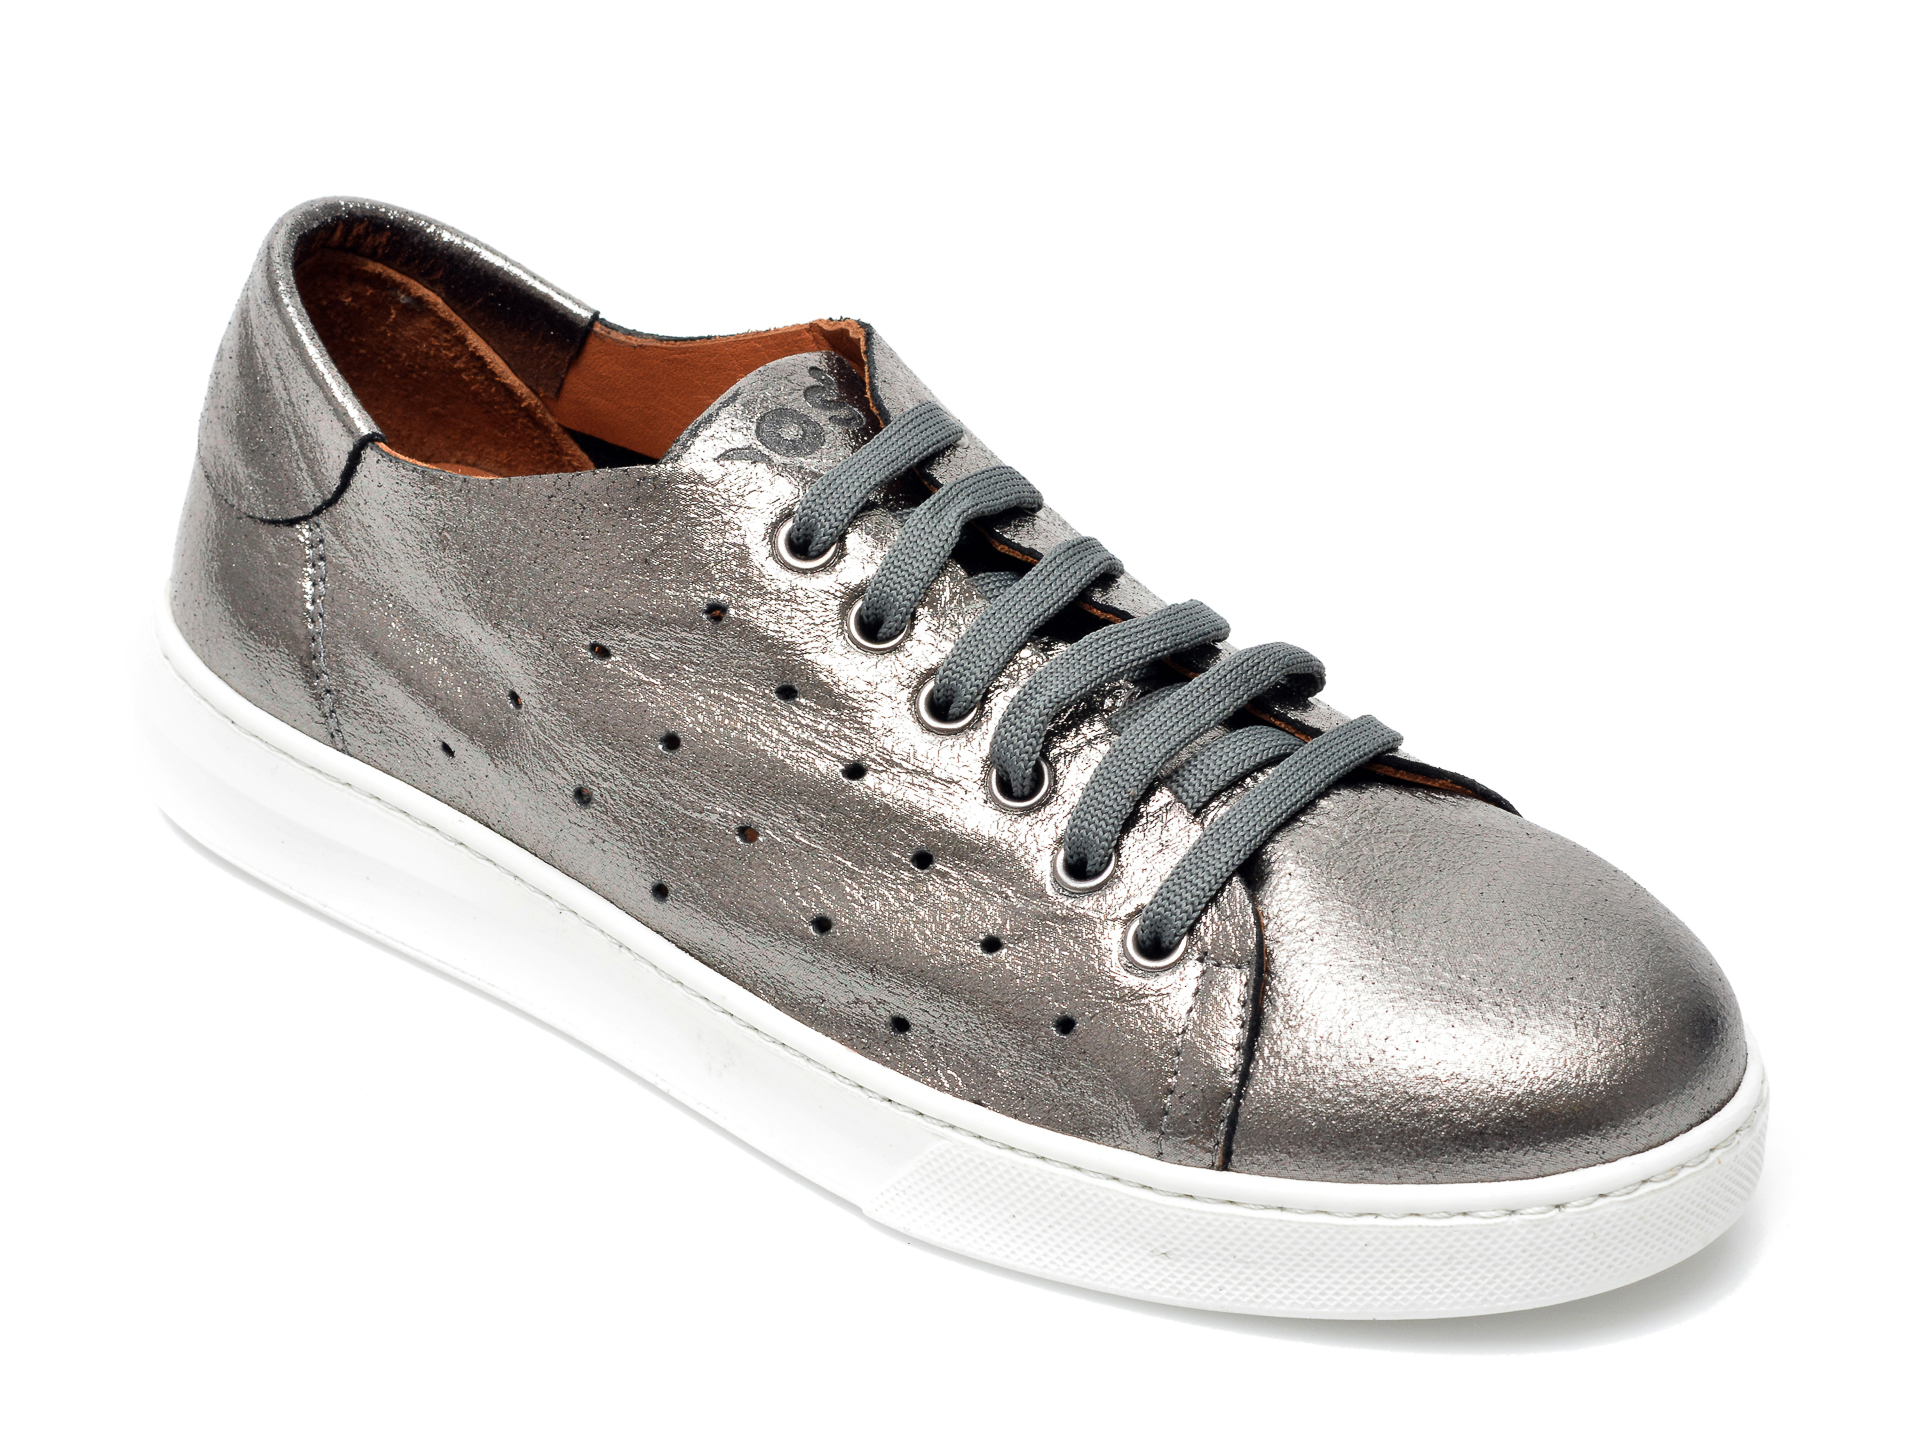 Pantofi BABOOS argintii, 2301, din piele naturala imagine otter.ro